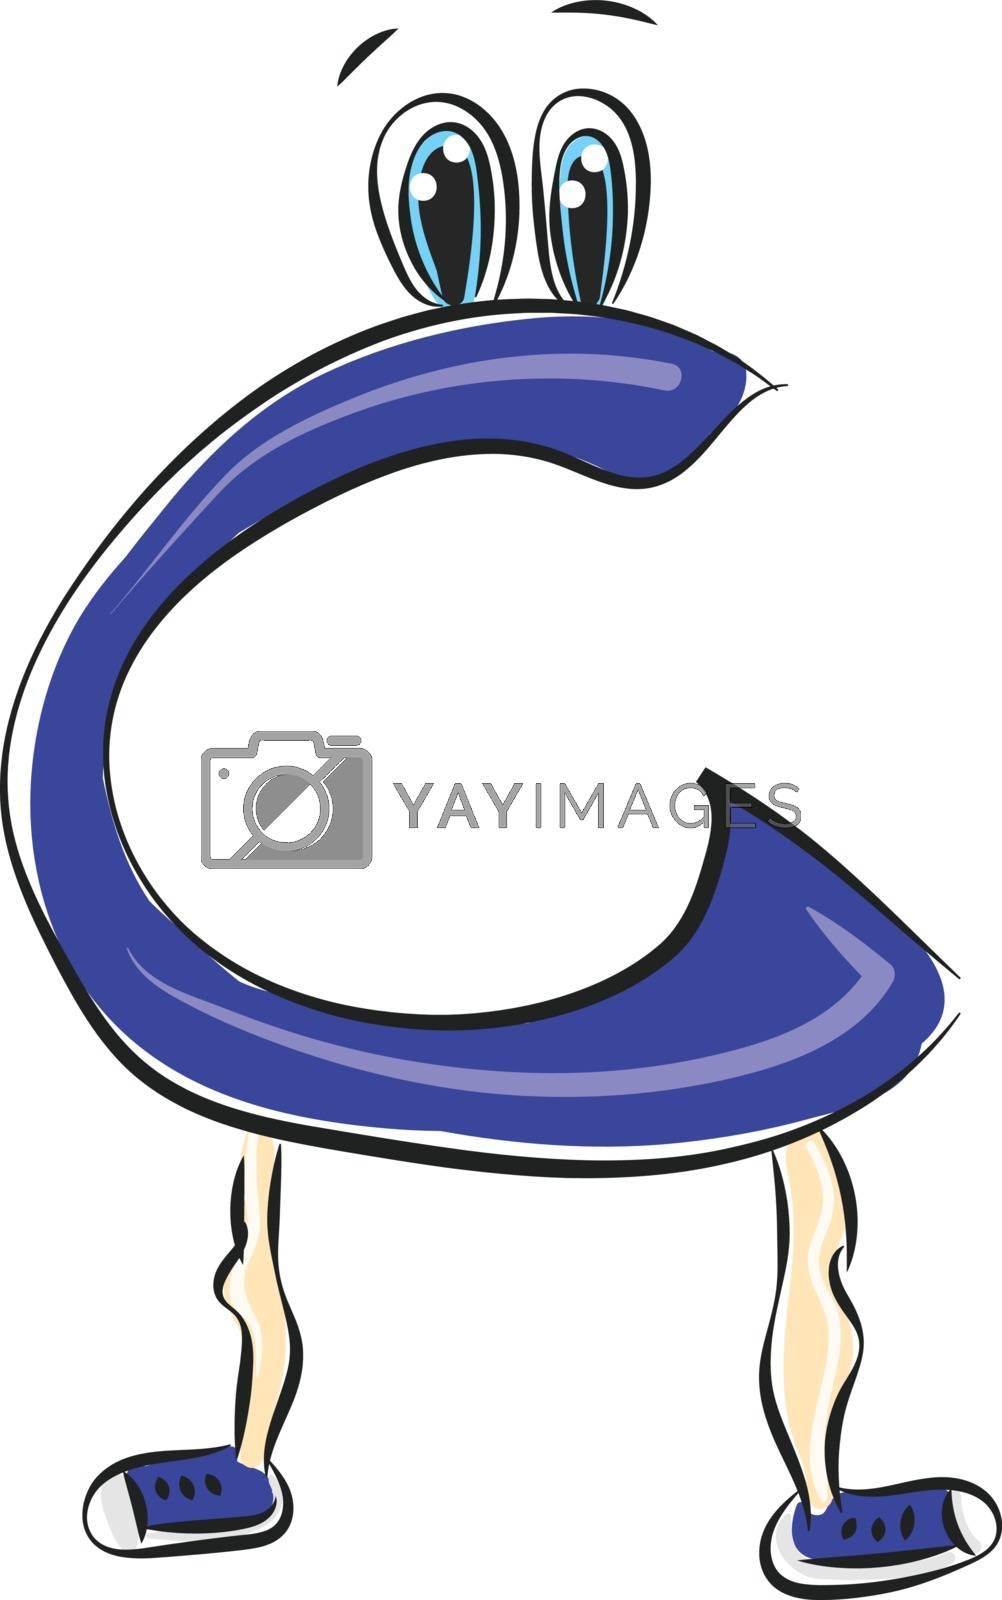 Royalty free image of Letter C alphabet emoji vector or color illustration by Morphart